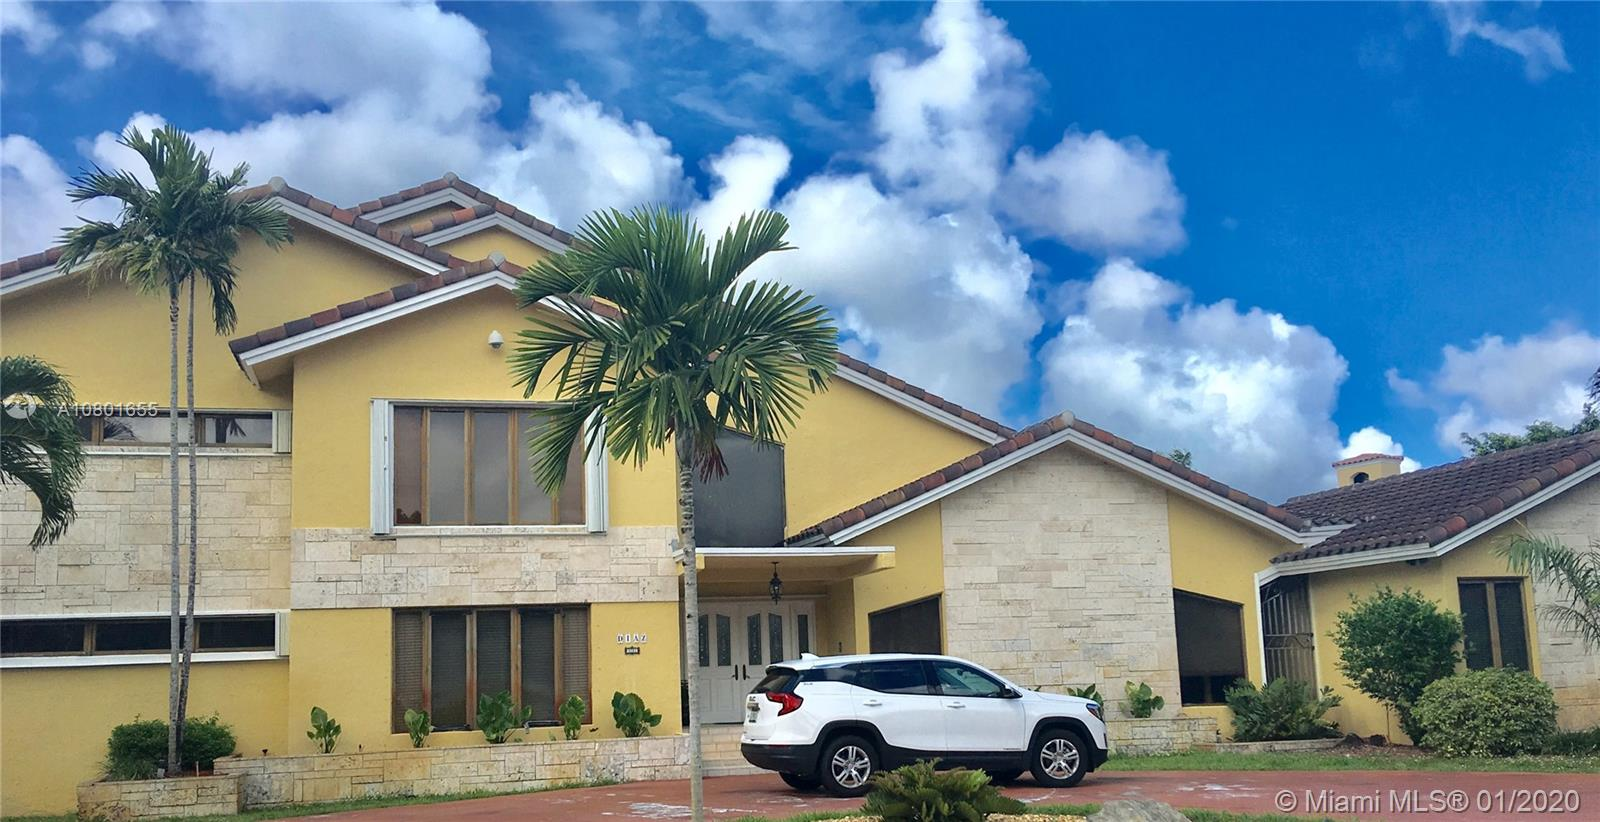 9301 SW 103rd St, Miami, FL 33176